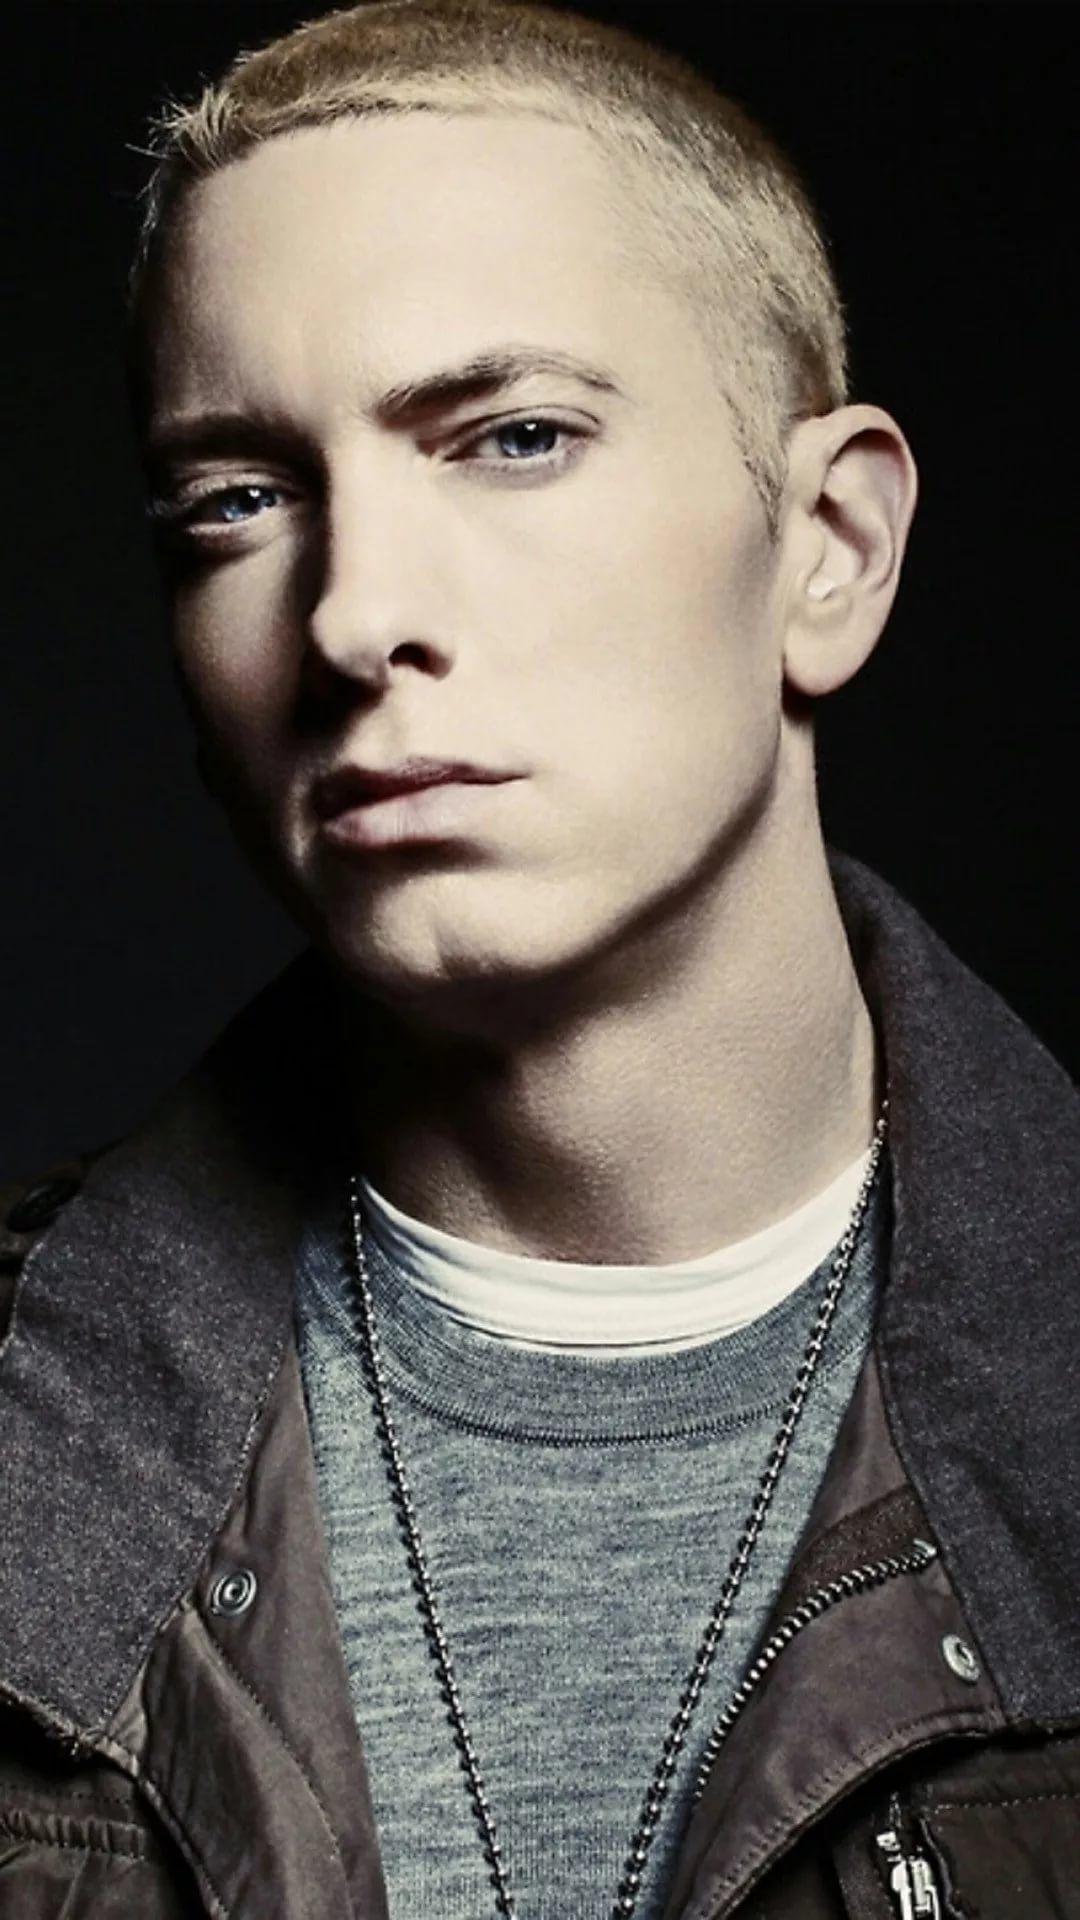 Eminem live wallpaper iPhone